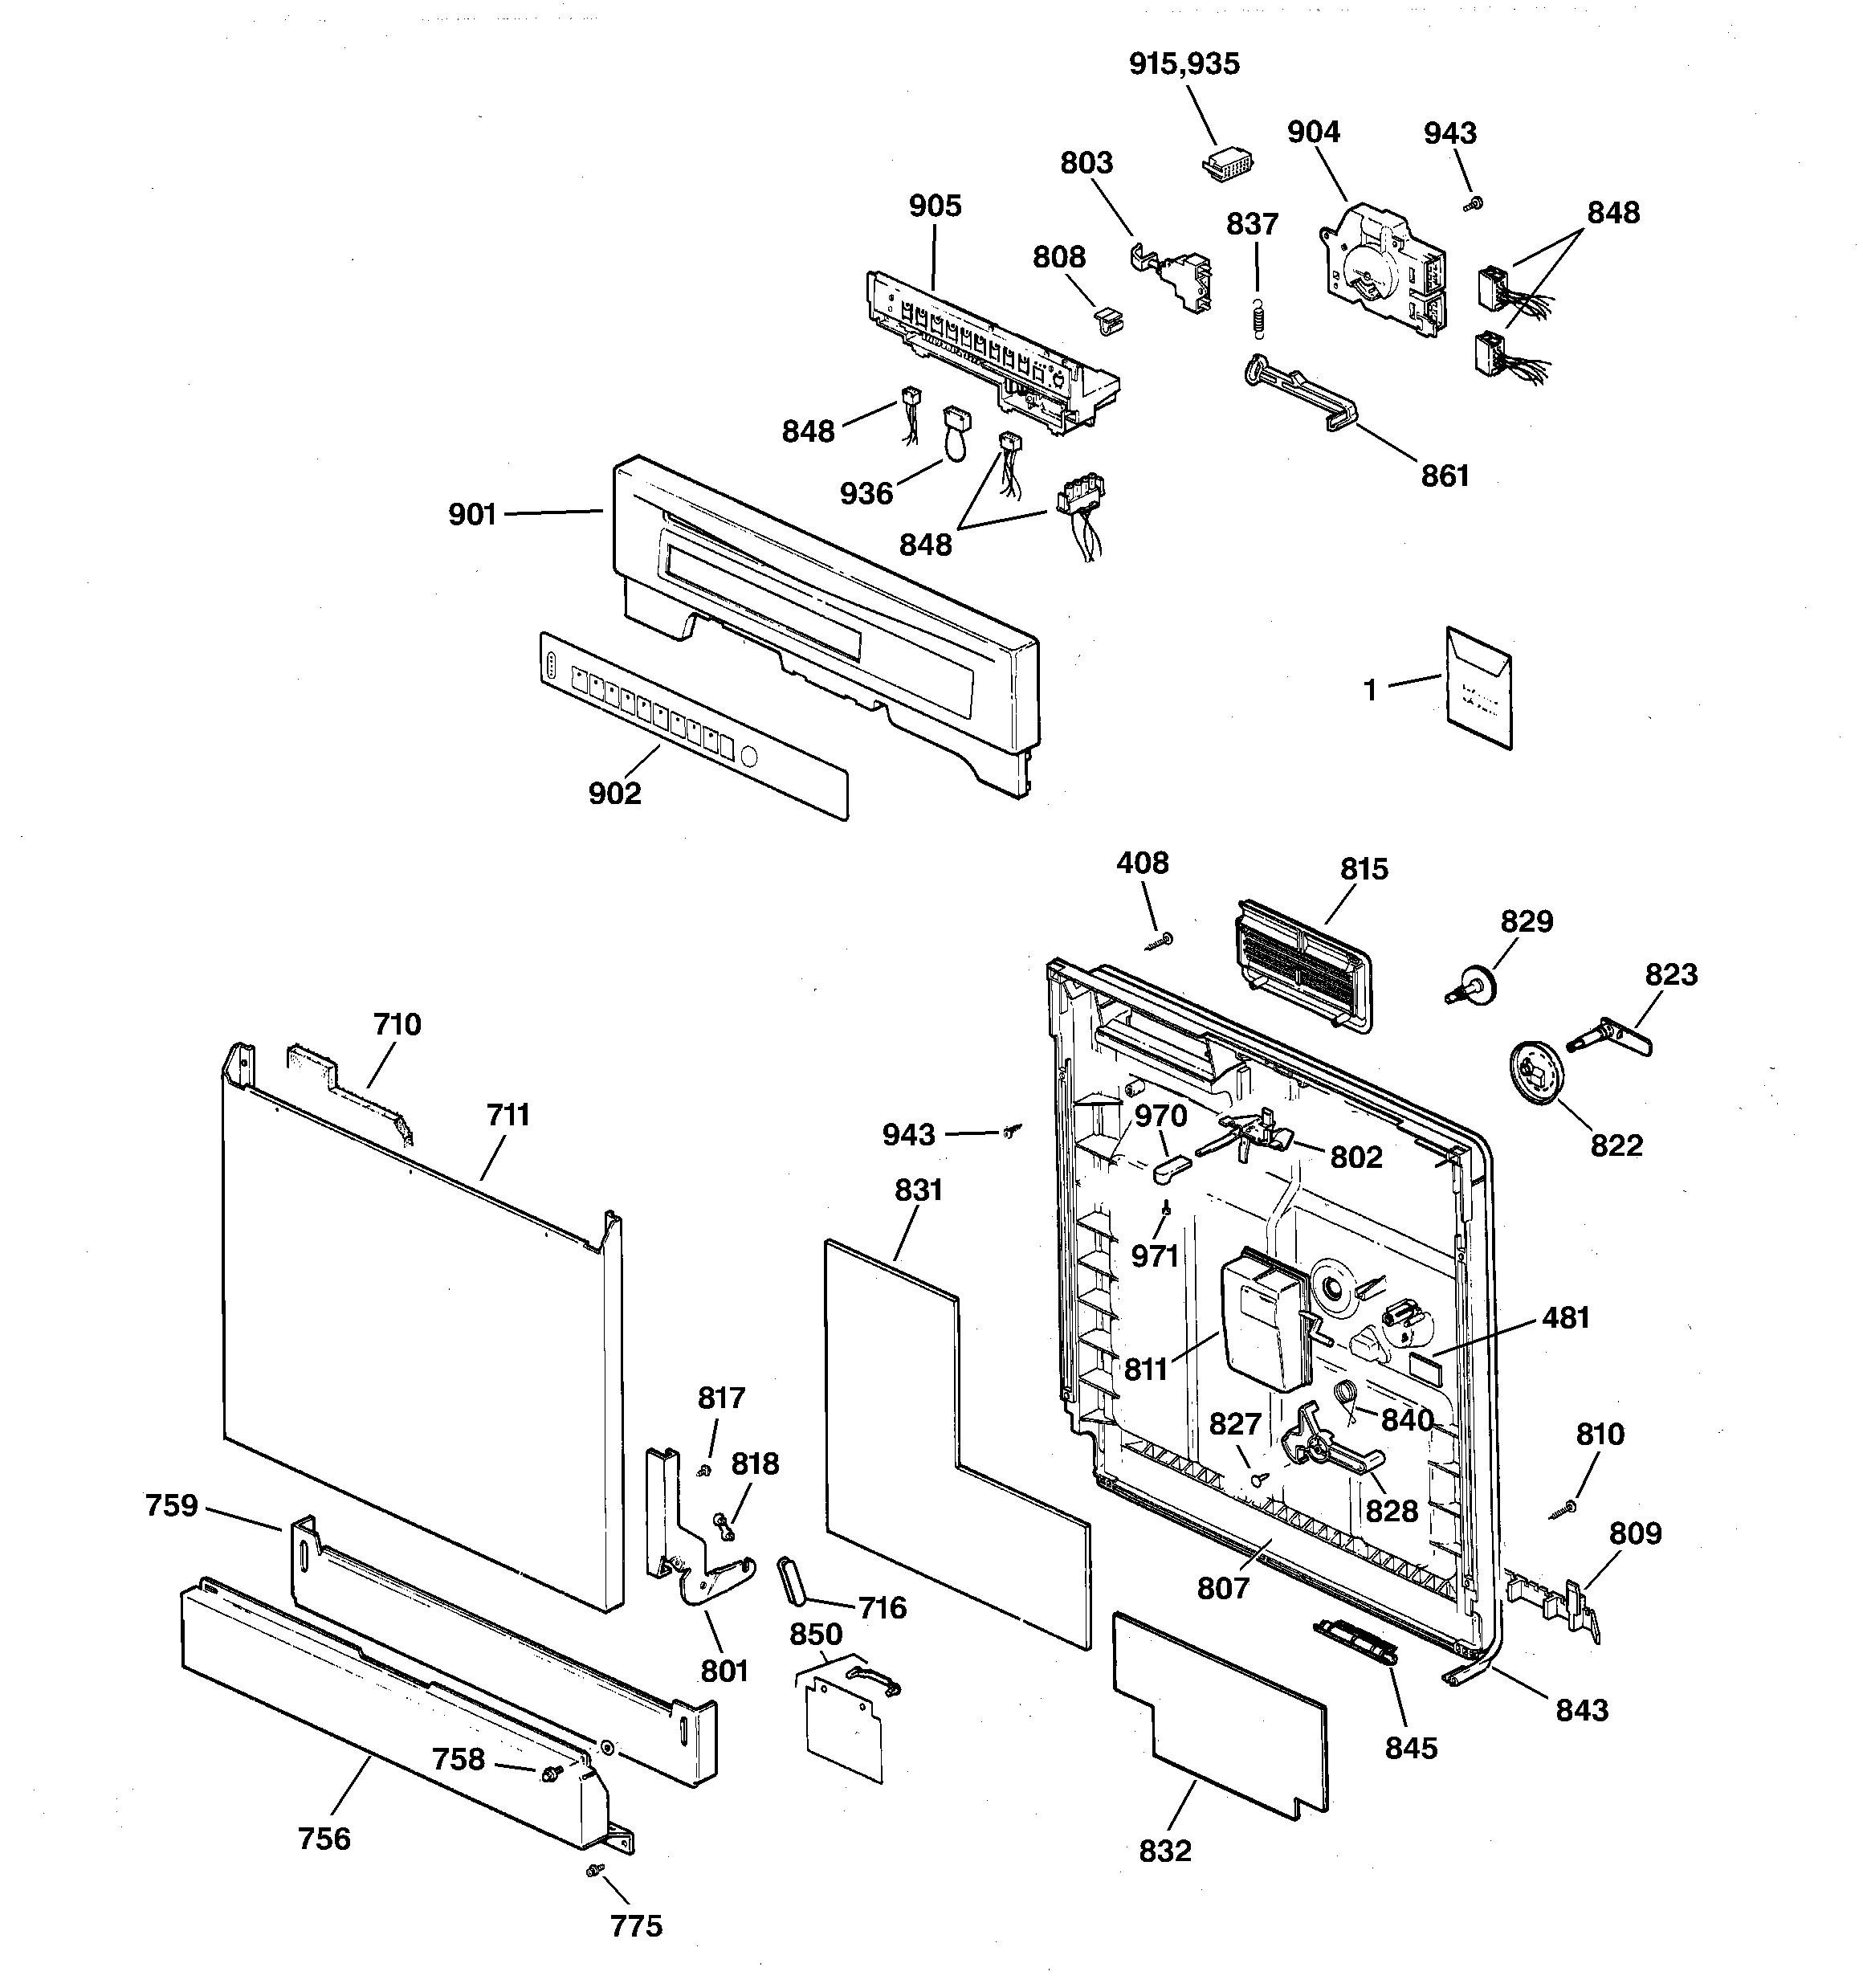 medium resolution of ge dishwasher diagram electrical wiring diagrams gdf520pgd4bb ge dishwasher diagram ge dishwasher diagrams